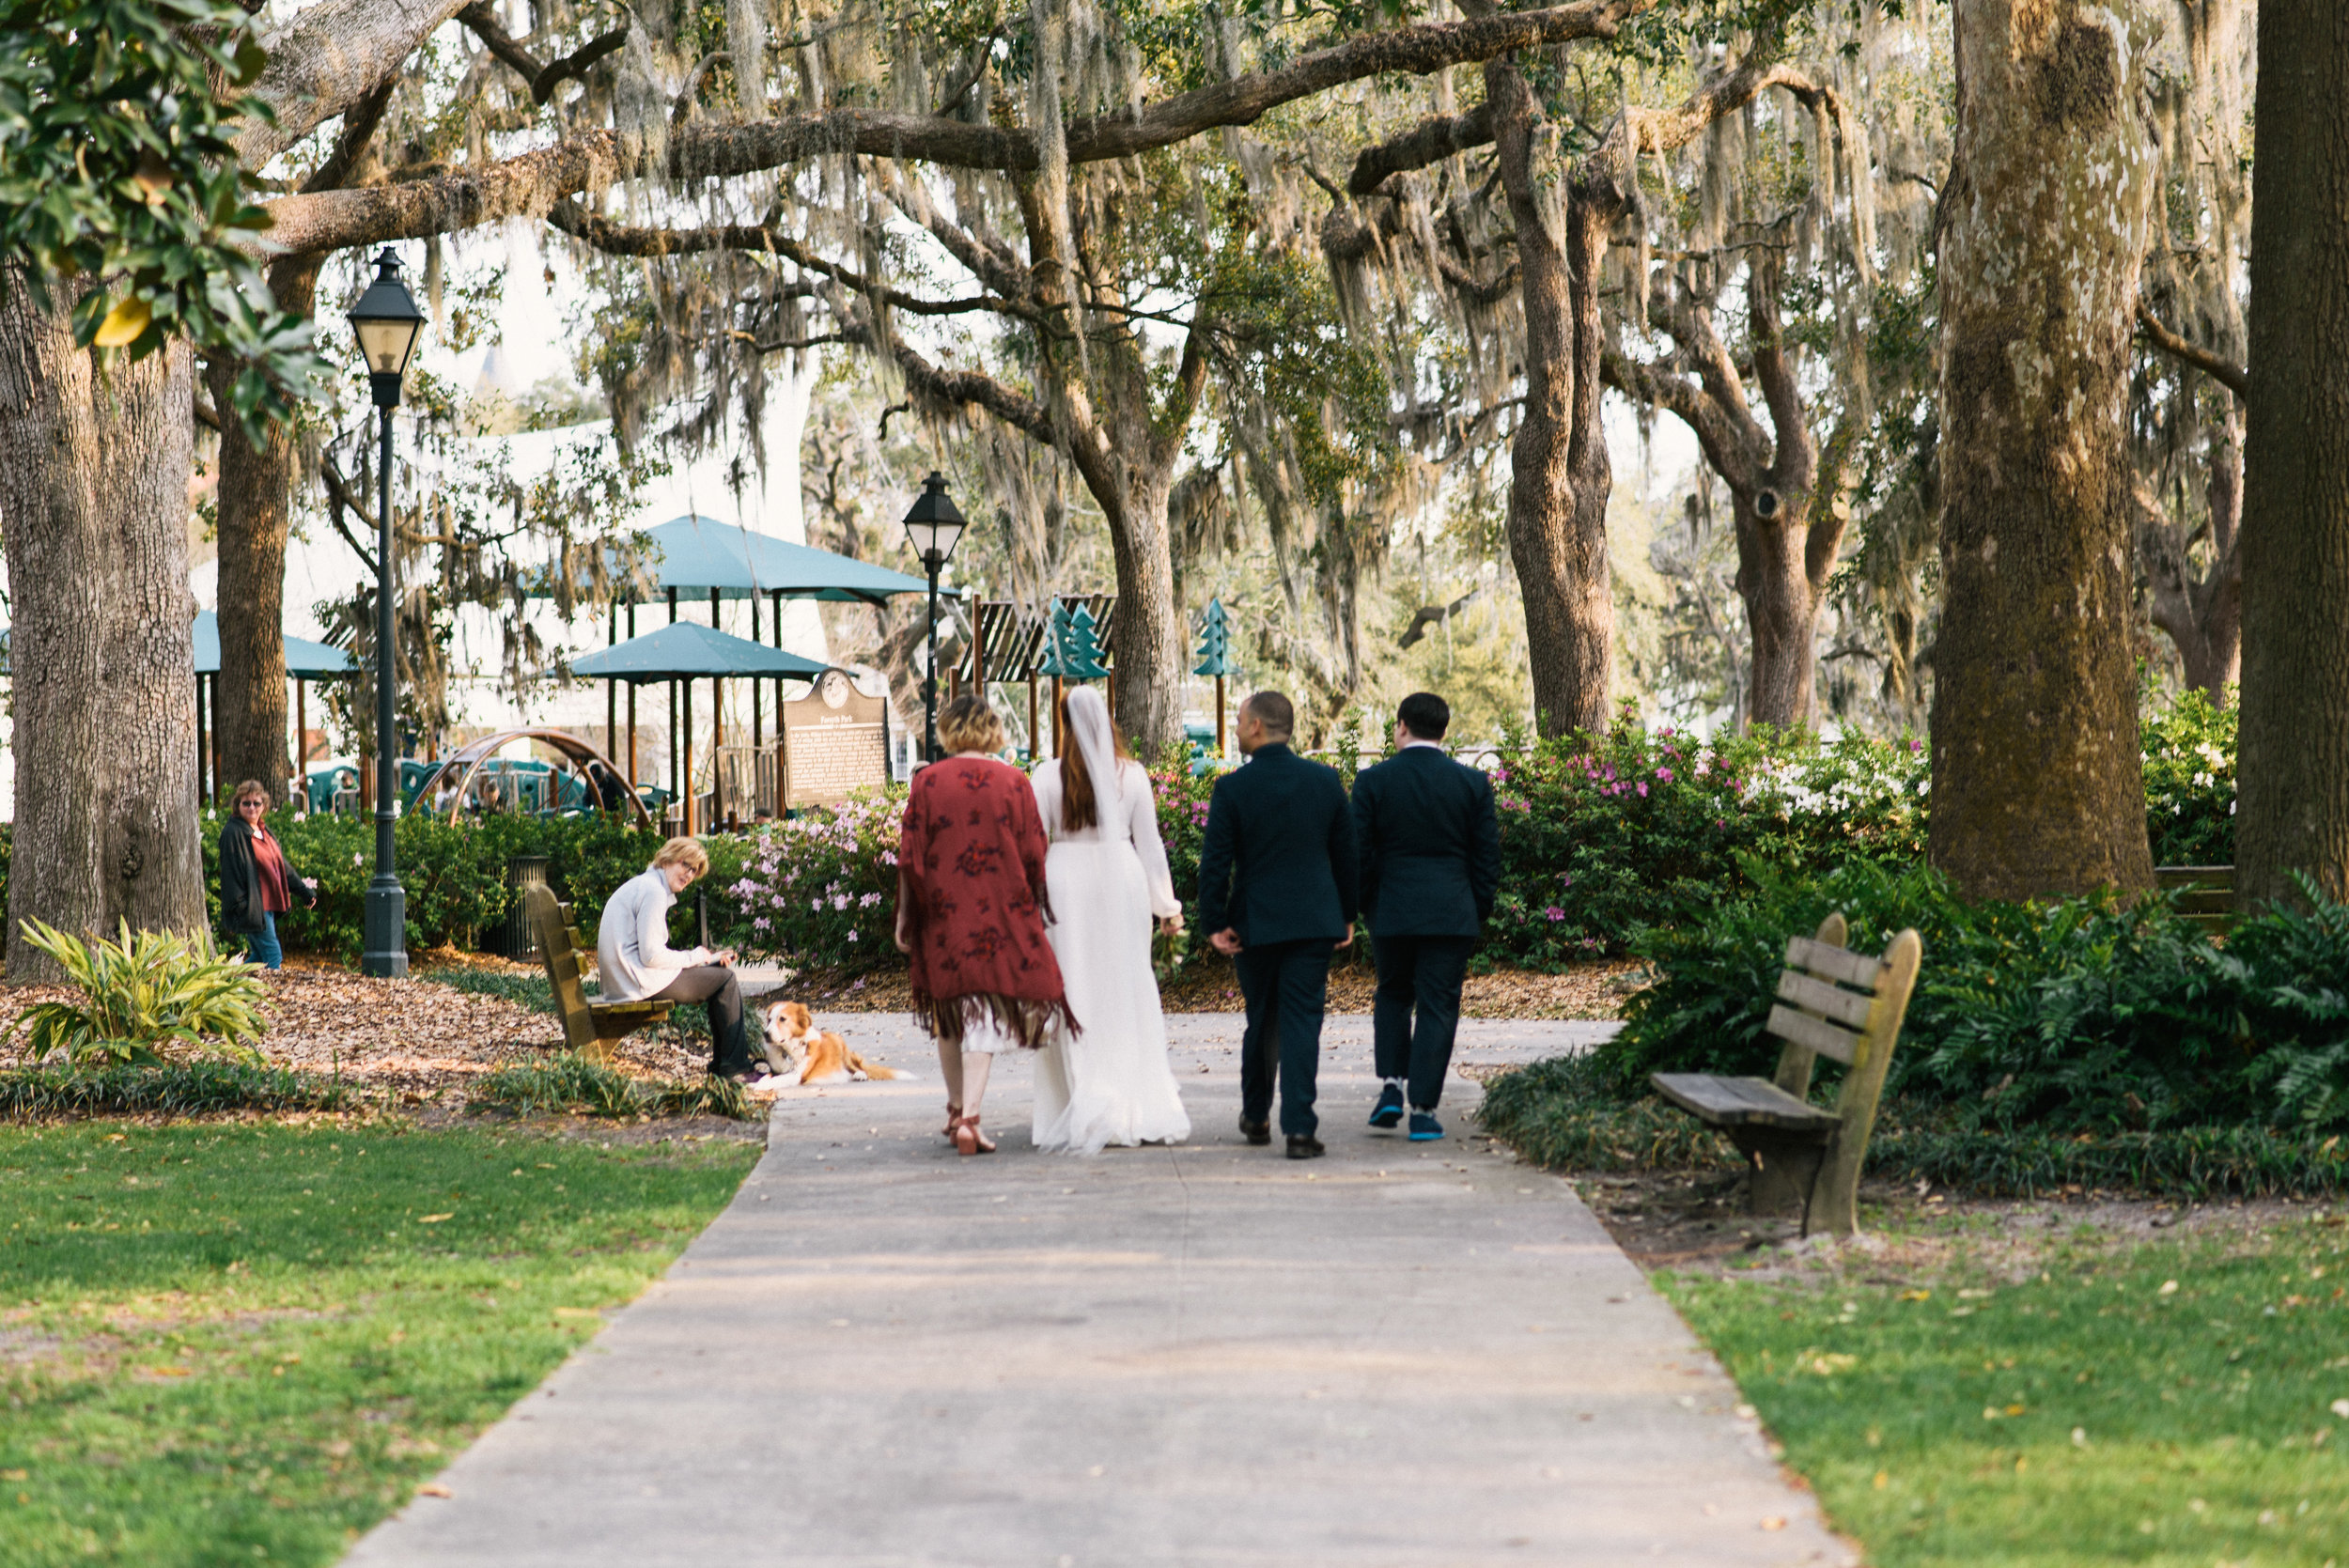 savannah-elopement-photography-savannah-georgia-elopement-photographer-savannah-wedding-photographer-meg-hill-photo-jade-hill- (39 of 58).jpg